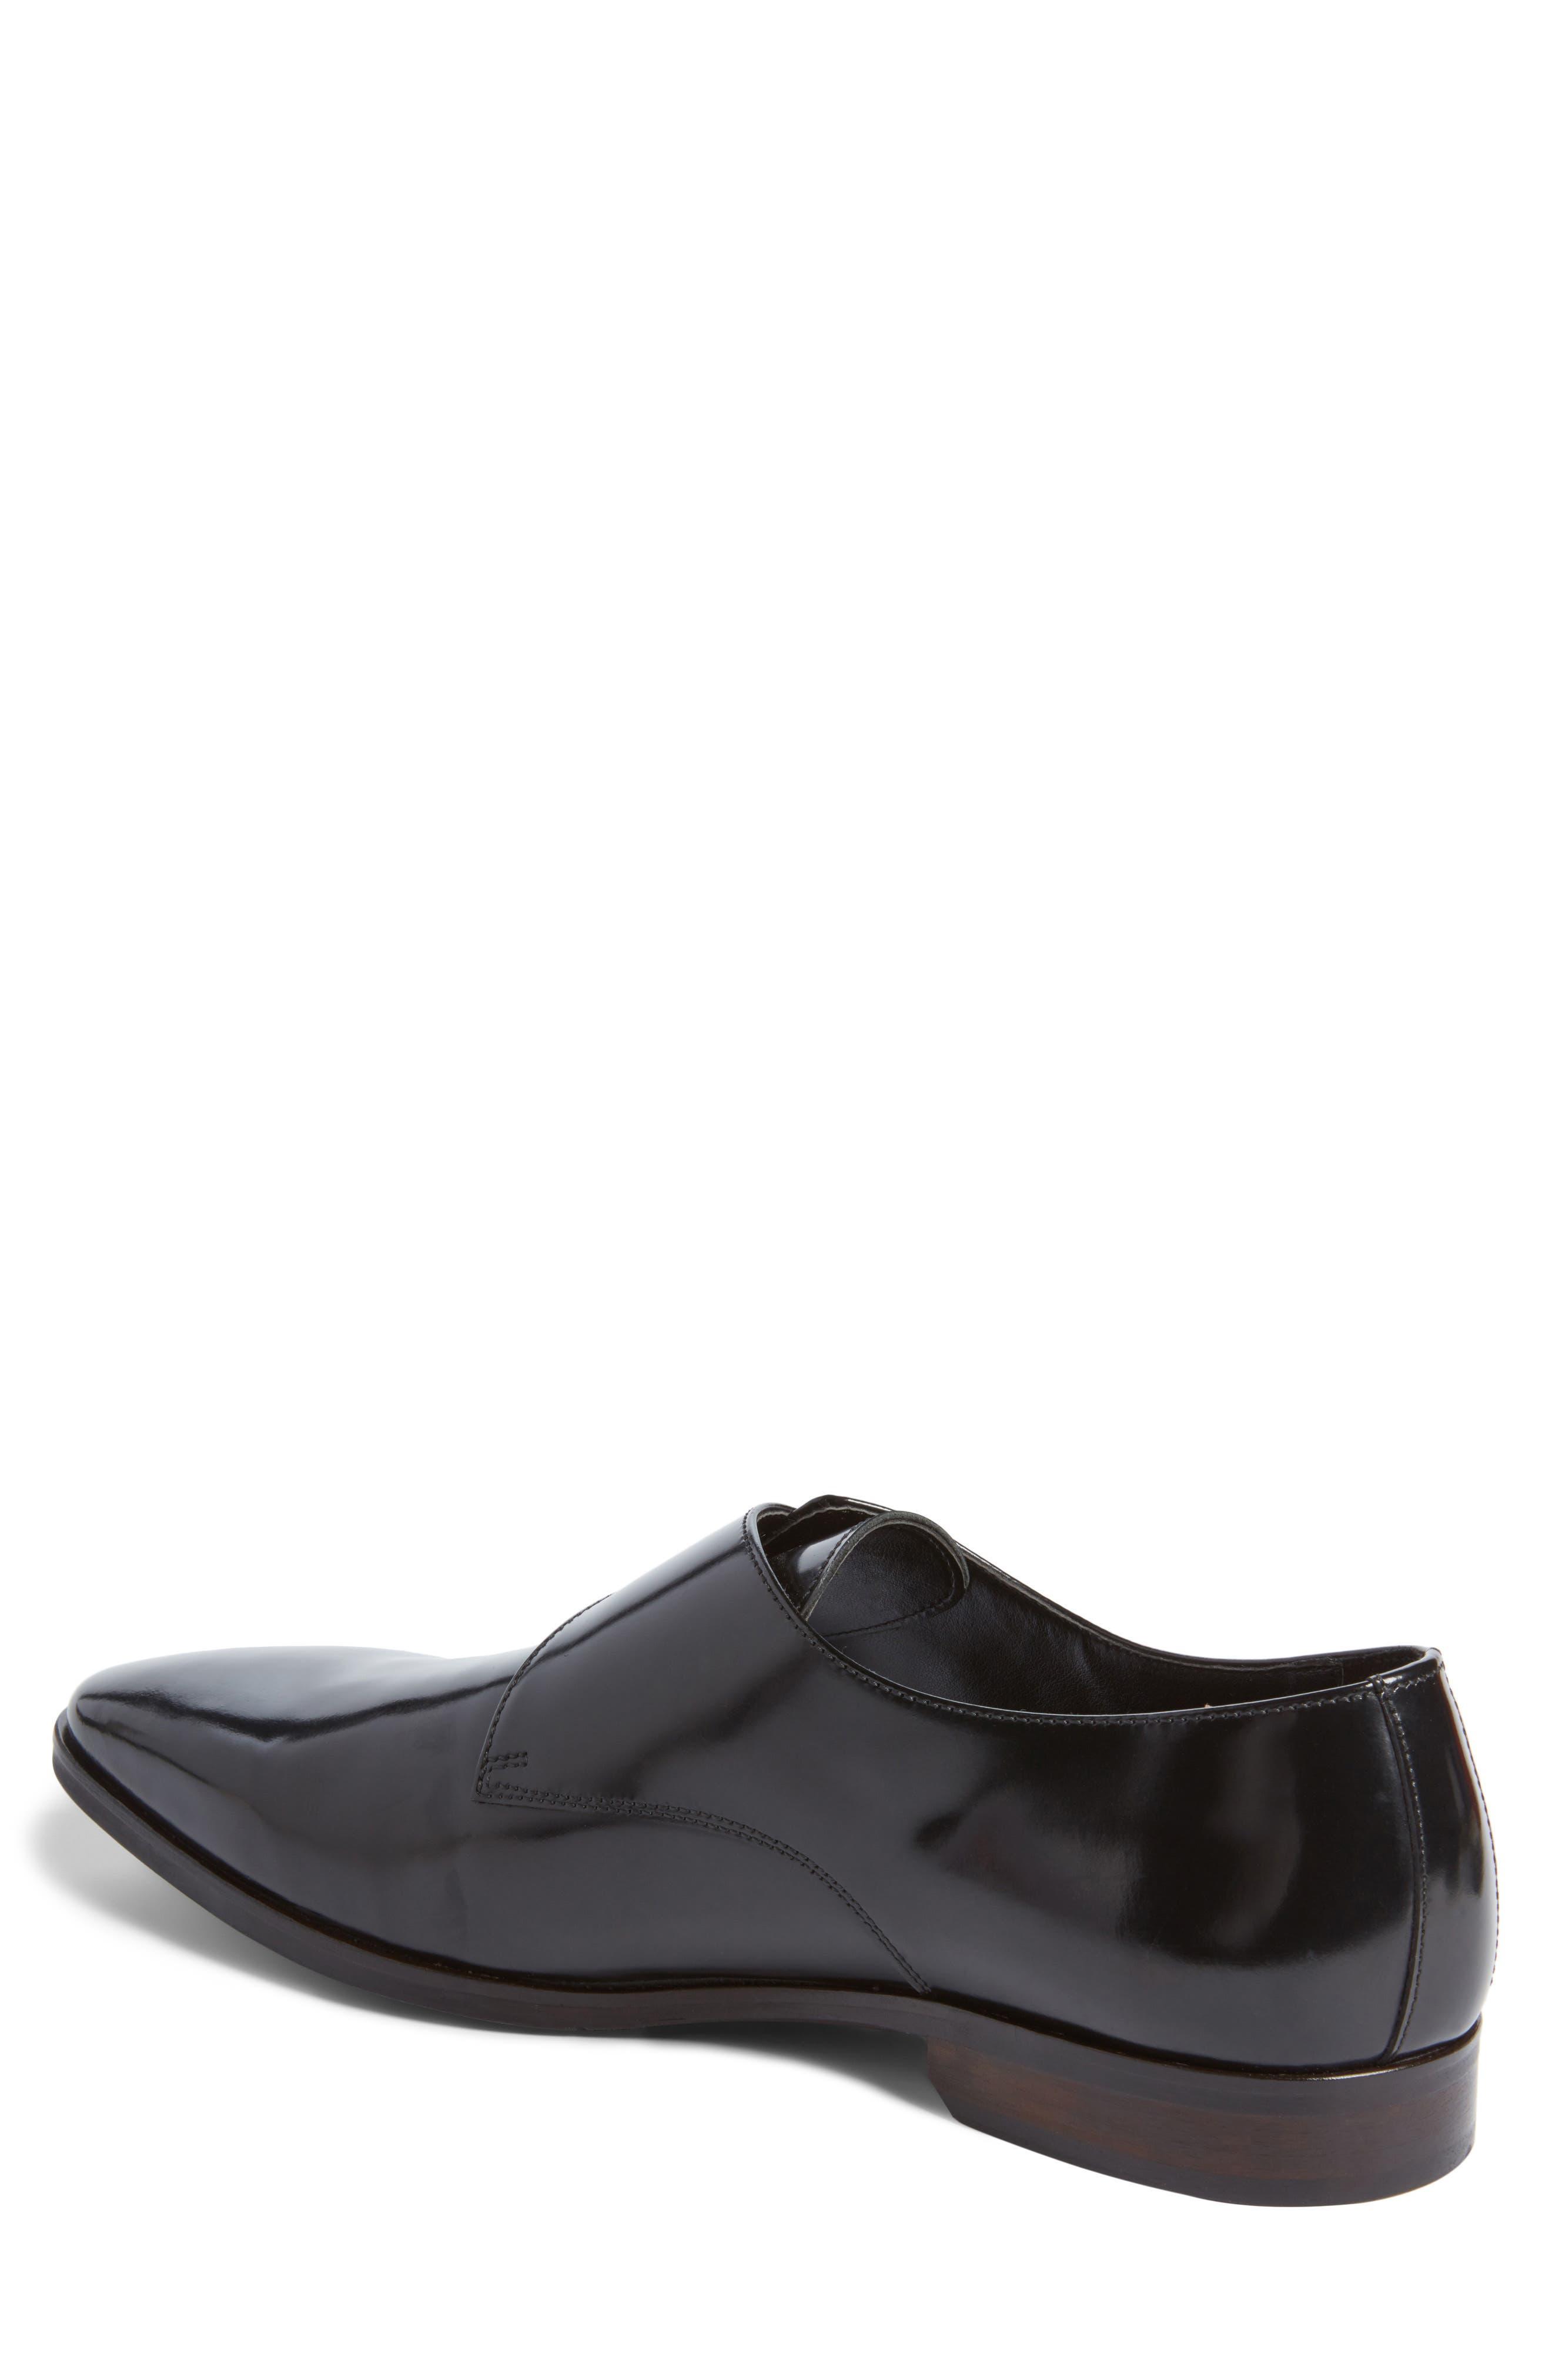 Alternate Image 2  - The Rail Webster Single Strap Monk Shoe (Men)